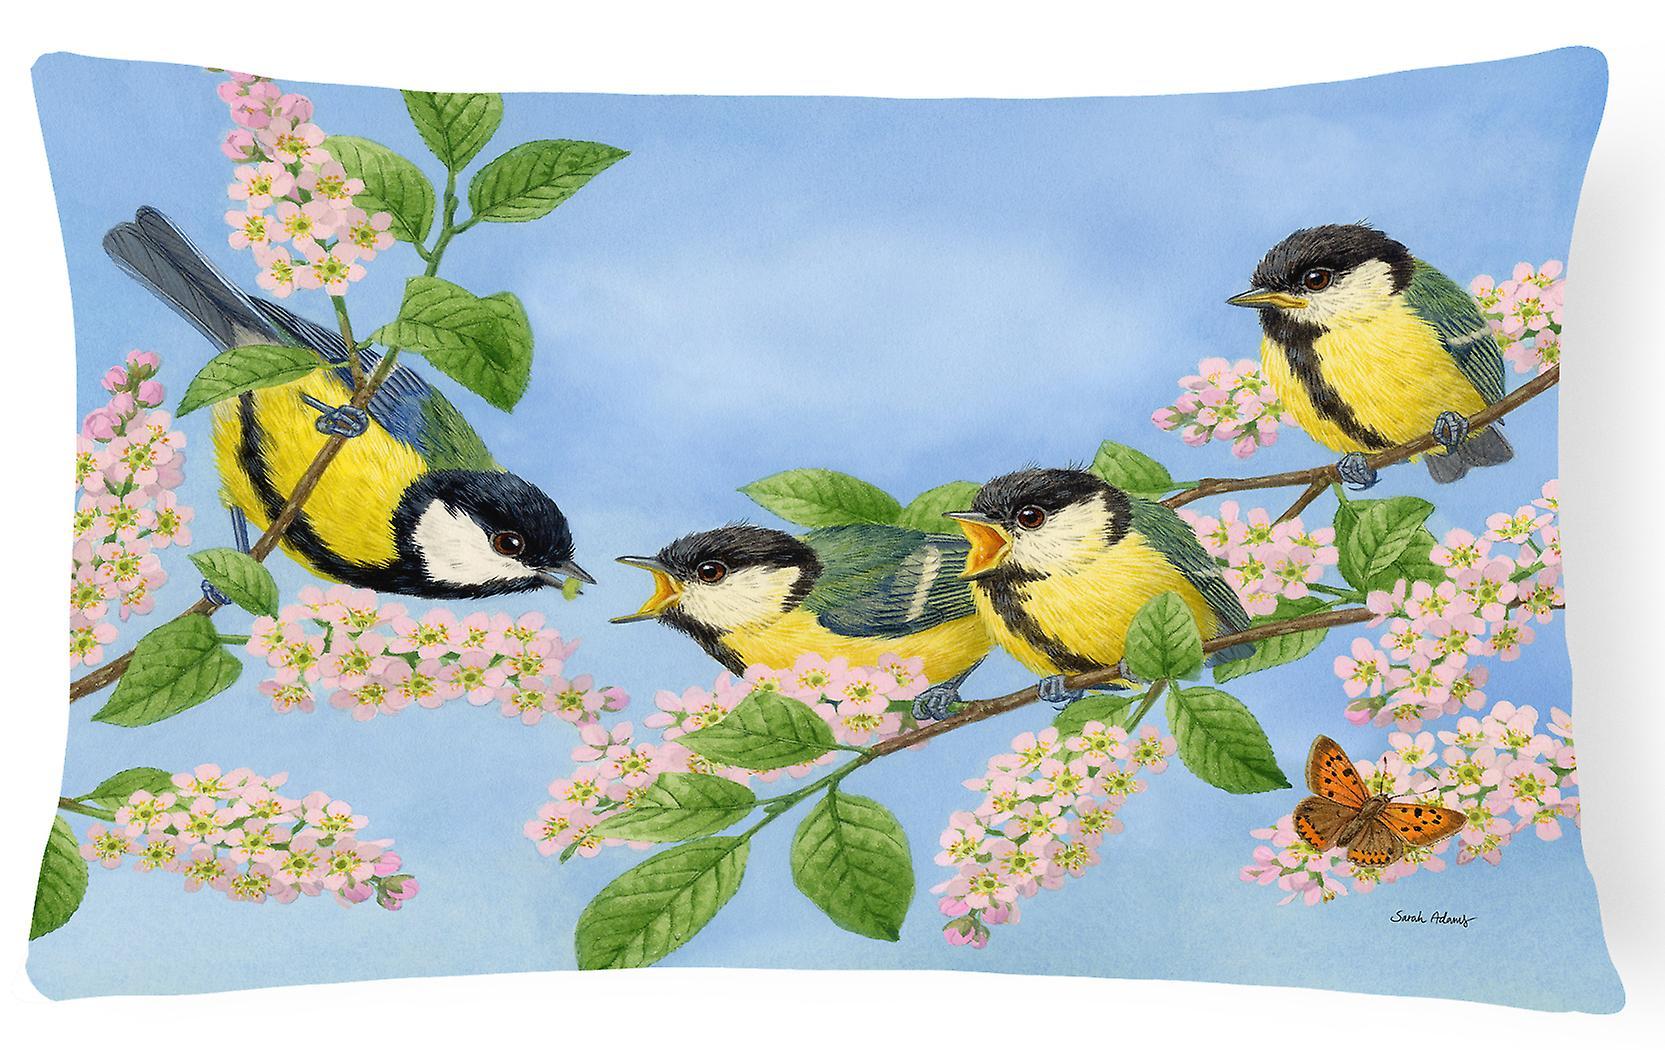 Great Tit Family Of Birds Fabric Decorative Pillow Fruugo